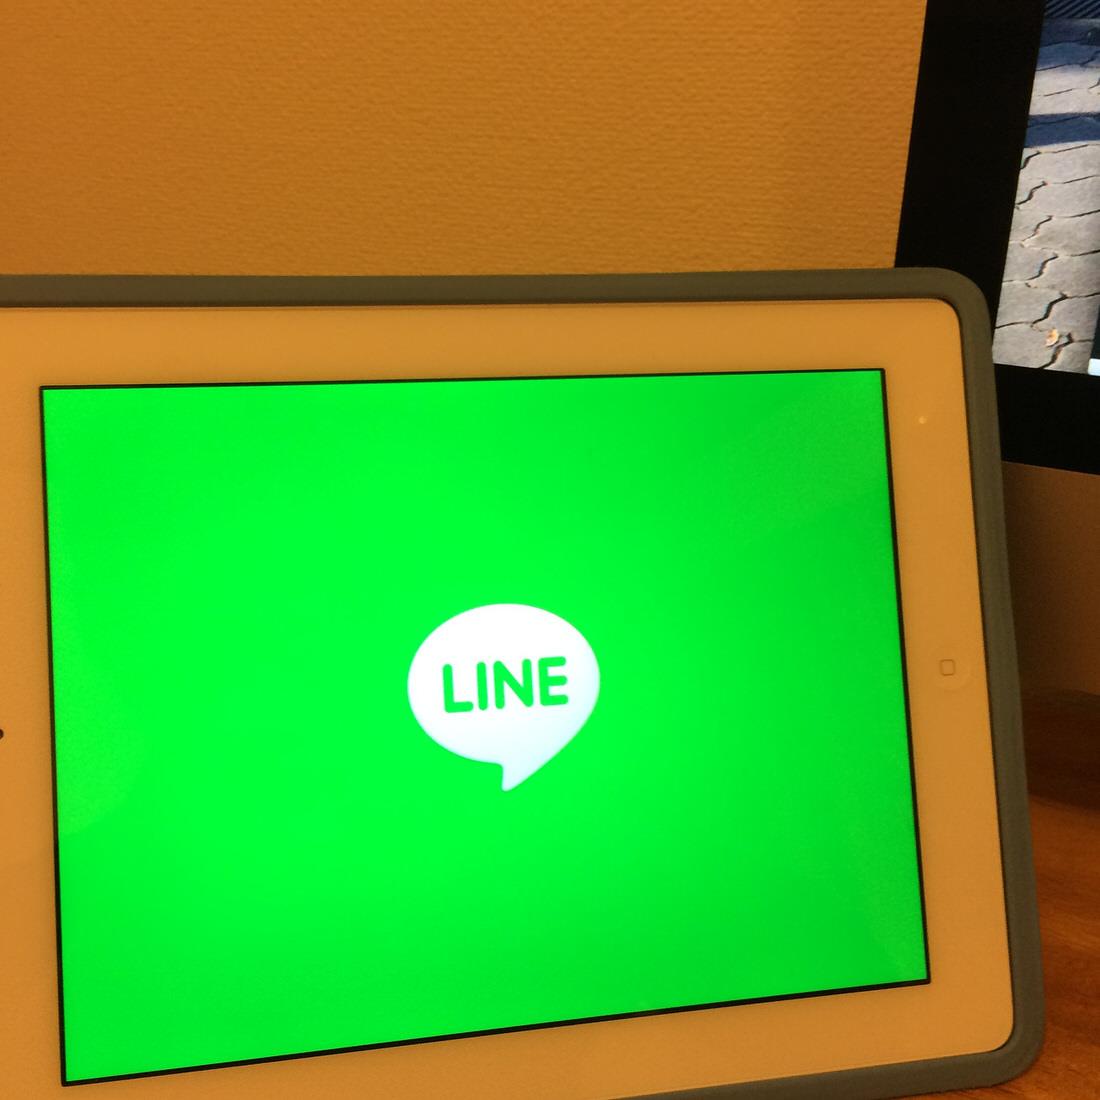 『LINE for iPad』をついに導入してみた感想